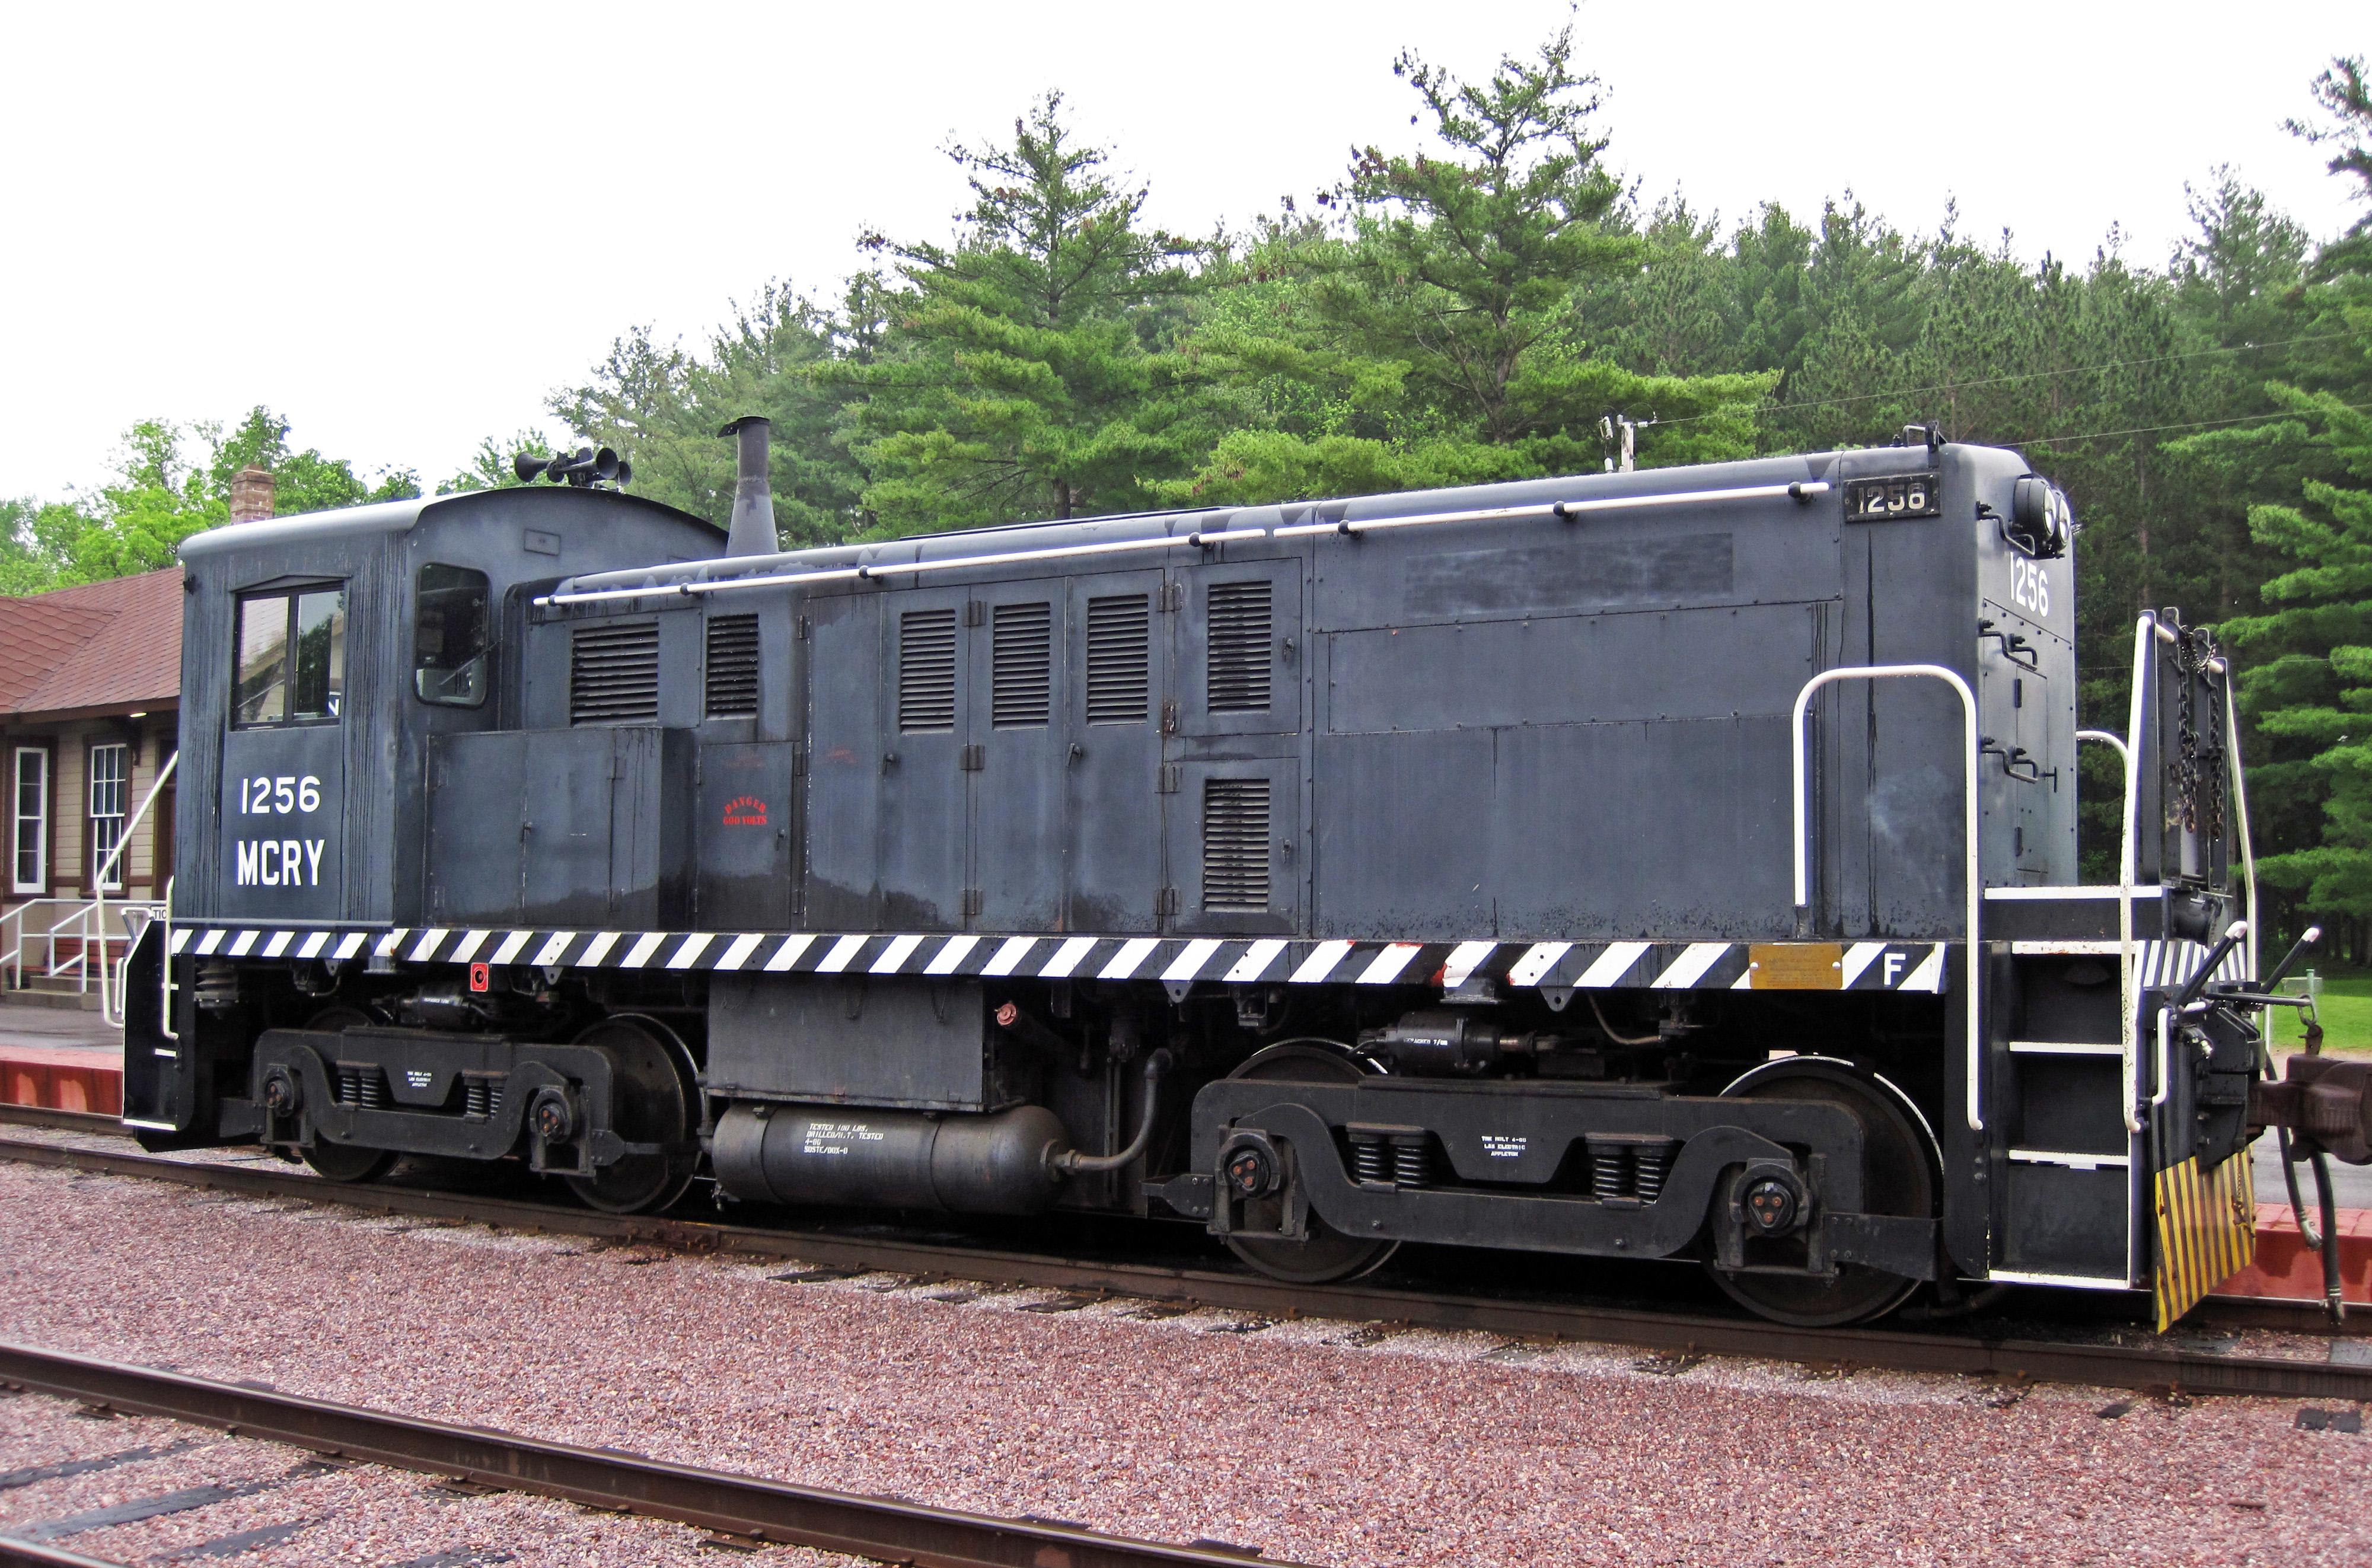 file mid continent railway 1256 diesel locomotive baldwin rs 4 tc rh commons wikimedia org Encevac with Havlogen TC 4 Scion tC 4 Door